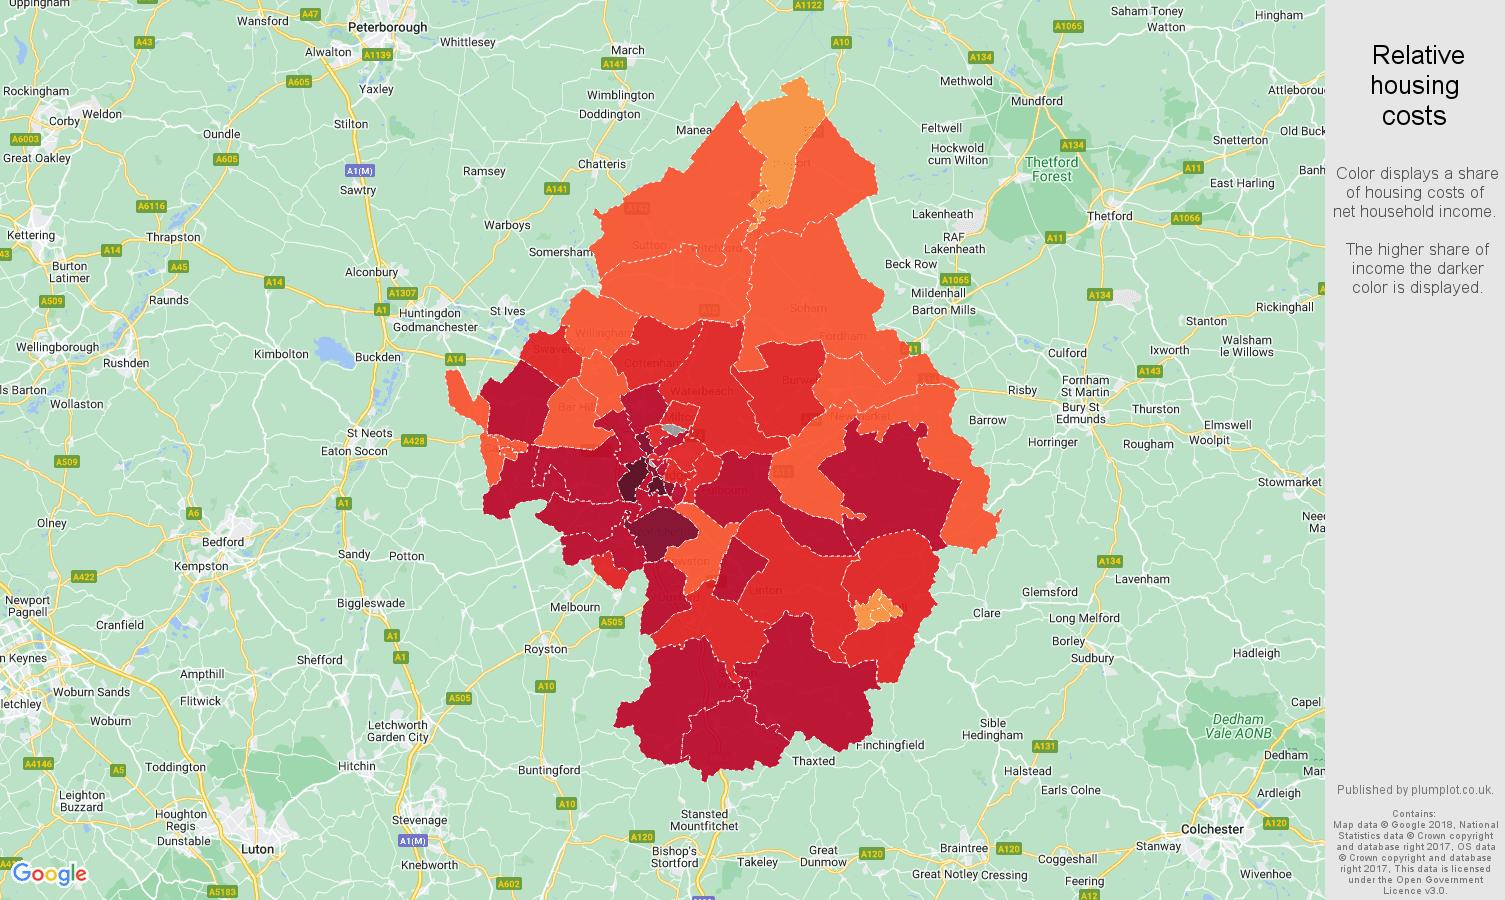 Cambridge relative housing costs map